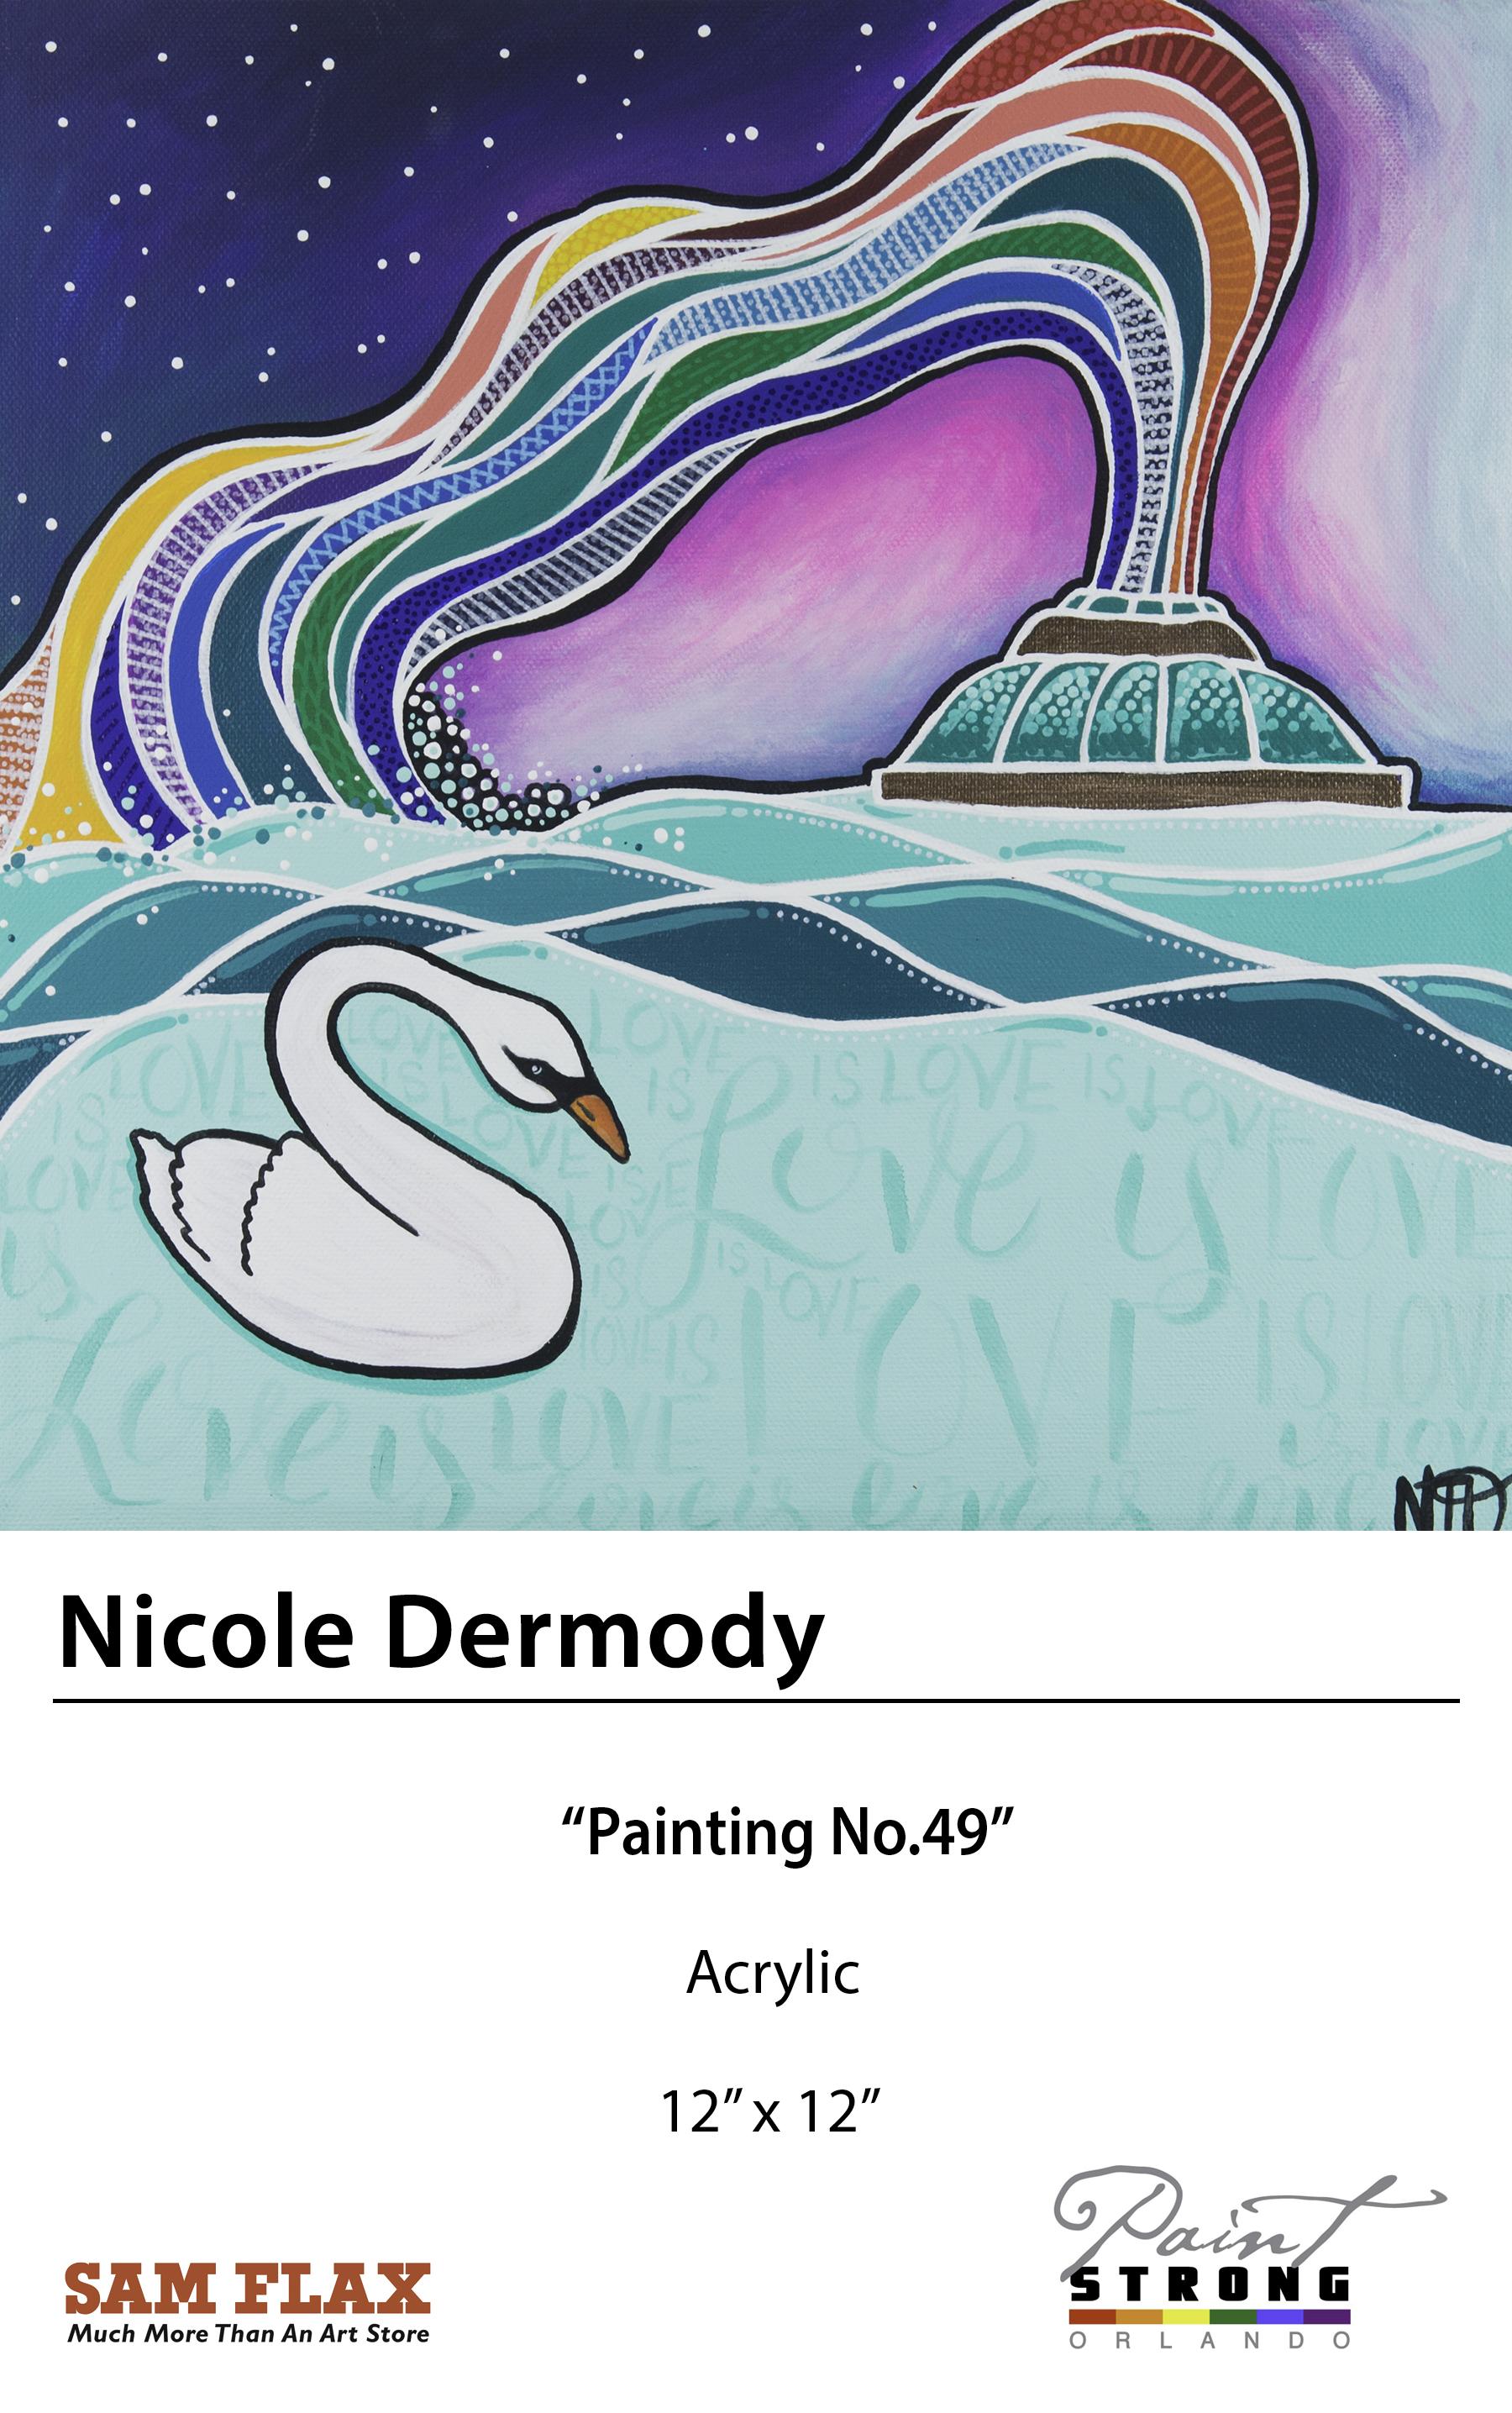 Nicole Dermody